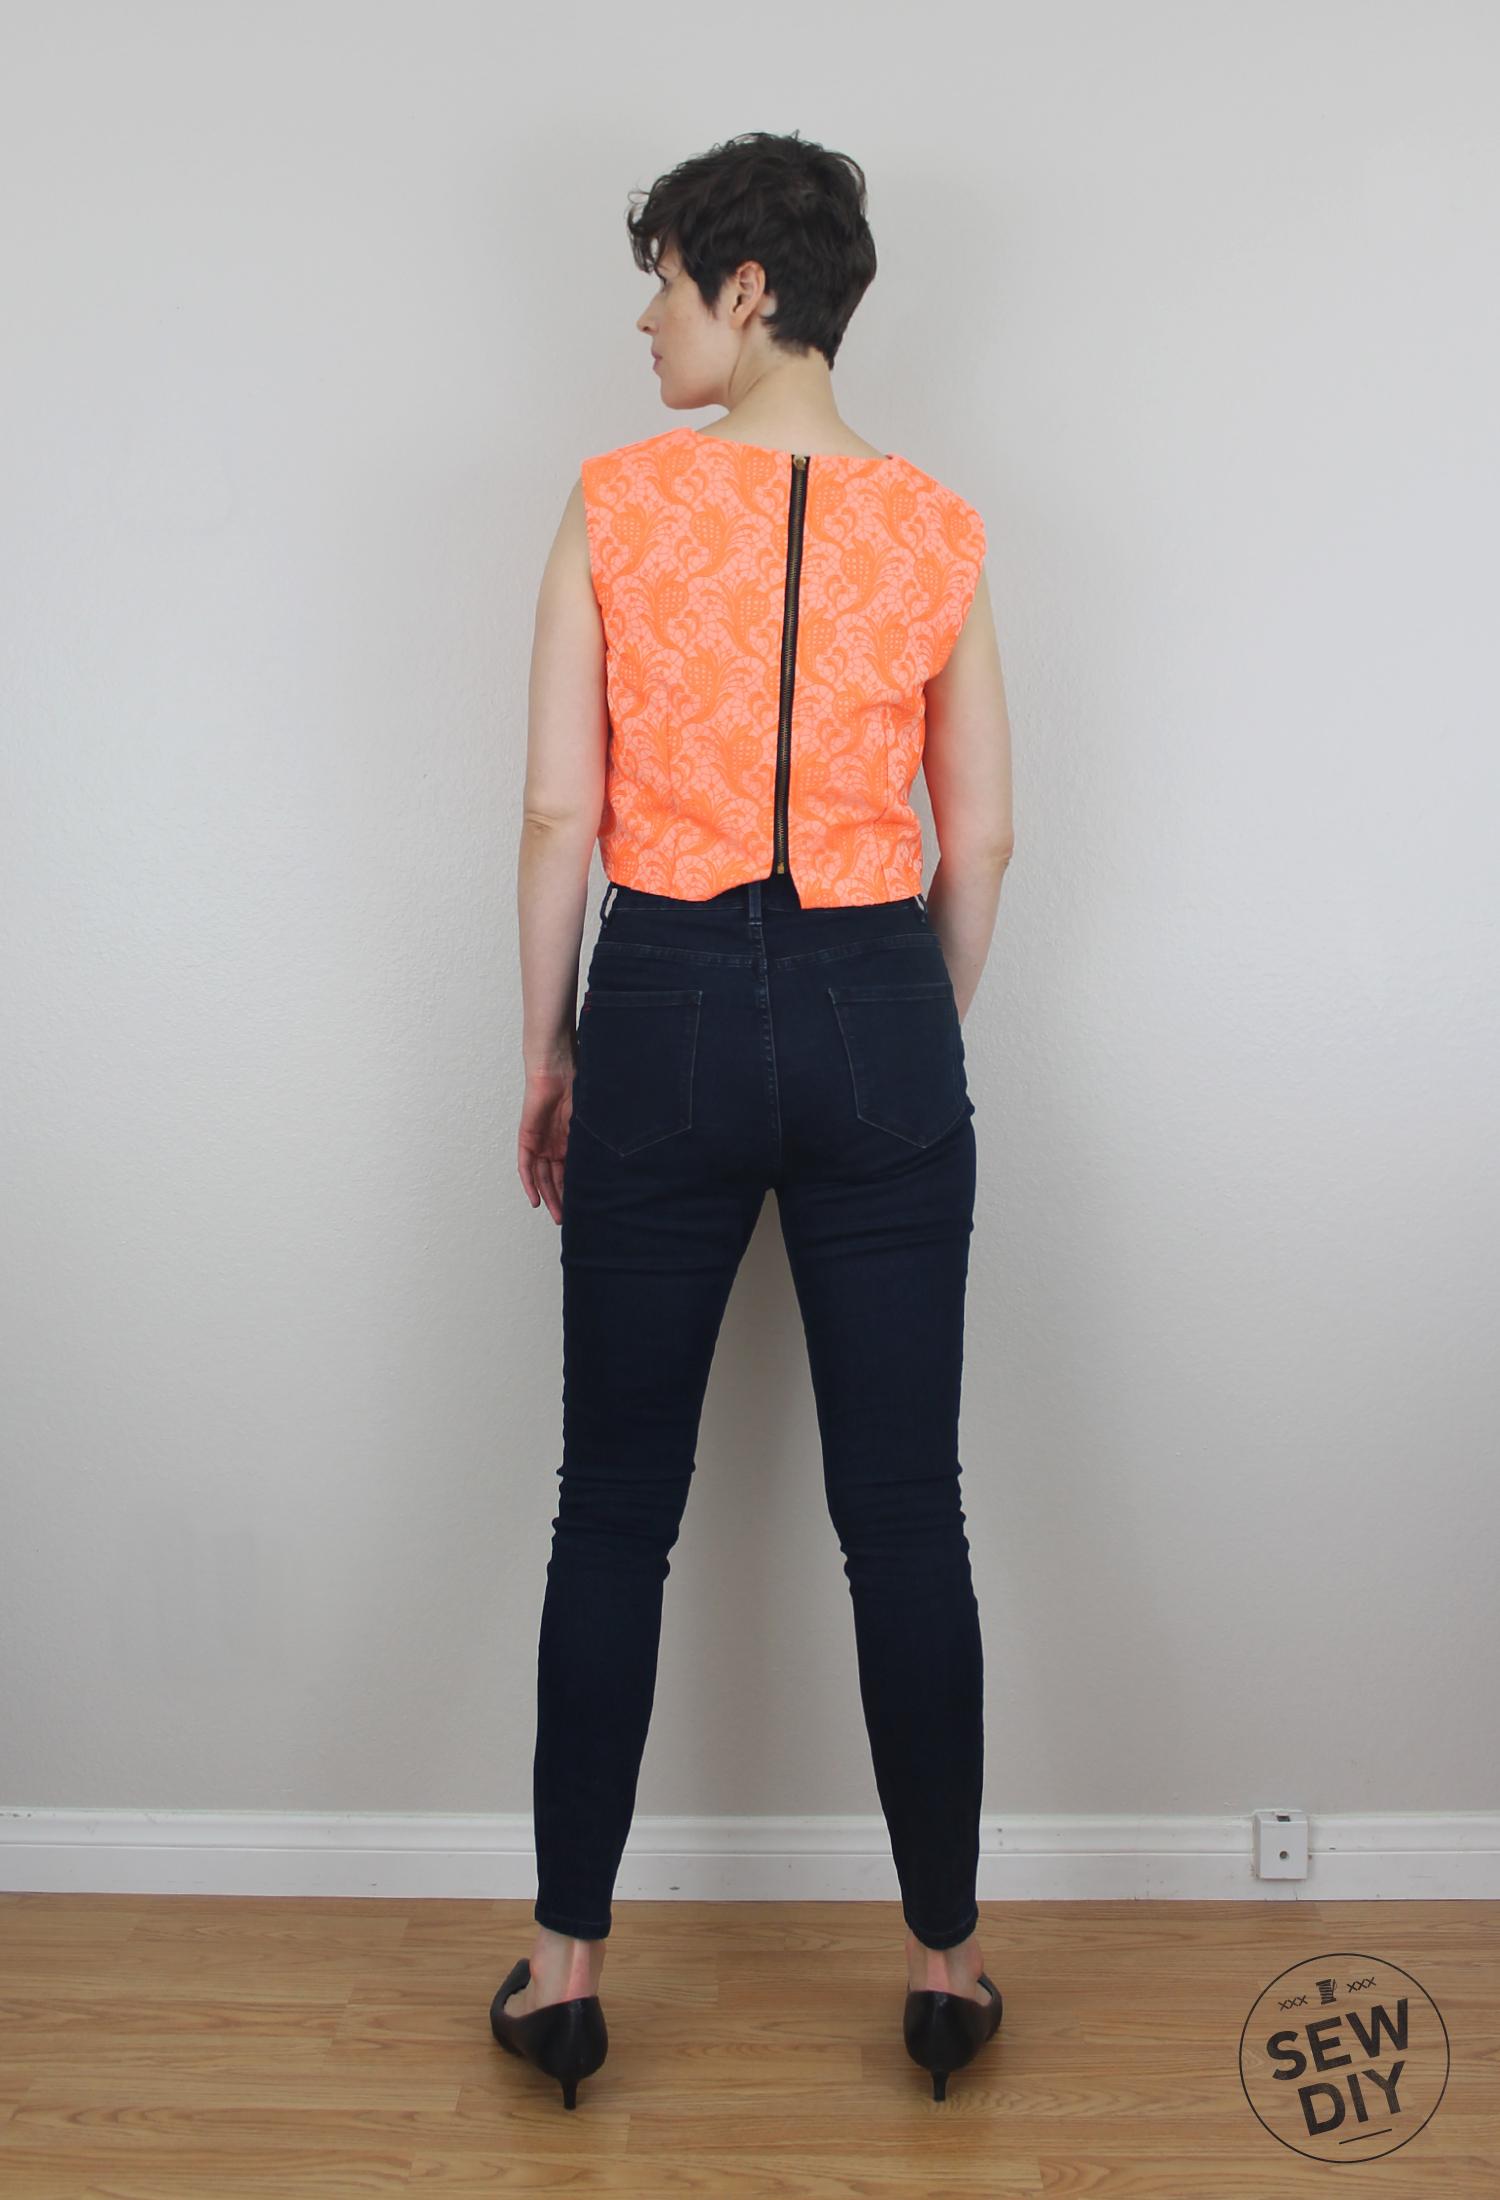 Sew DIY Brocade Crop Top Back